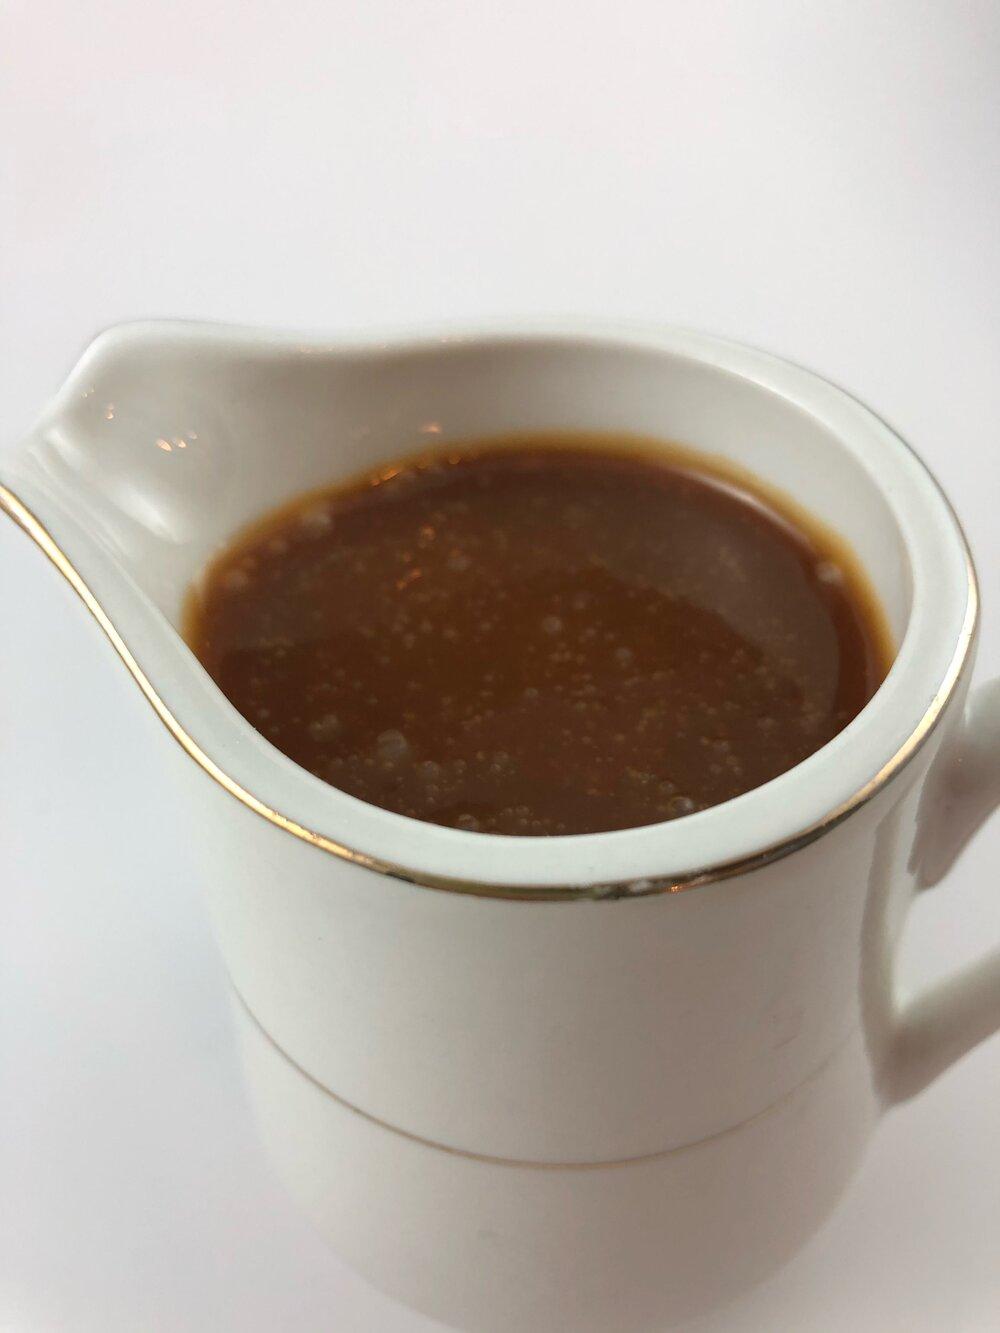 Missouri Girl quick and easy 4 ingredient homemade sea salt caramel sauce